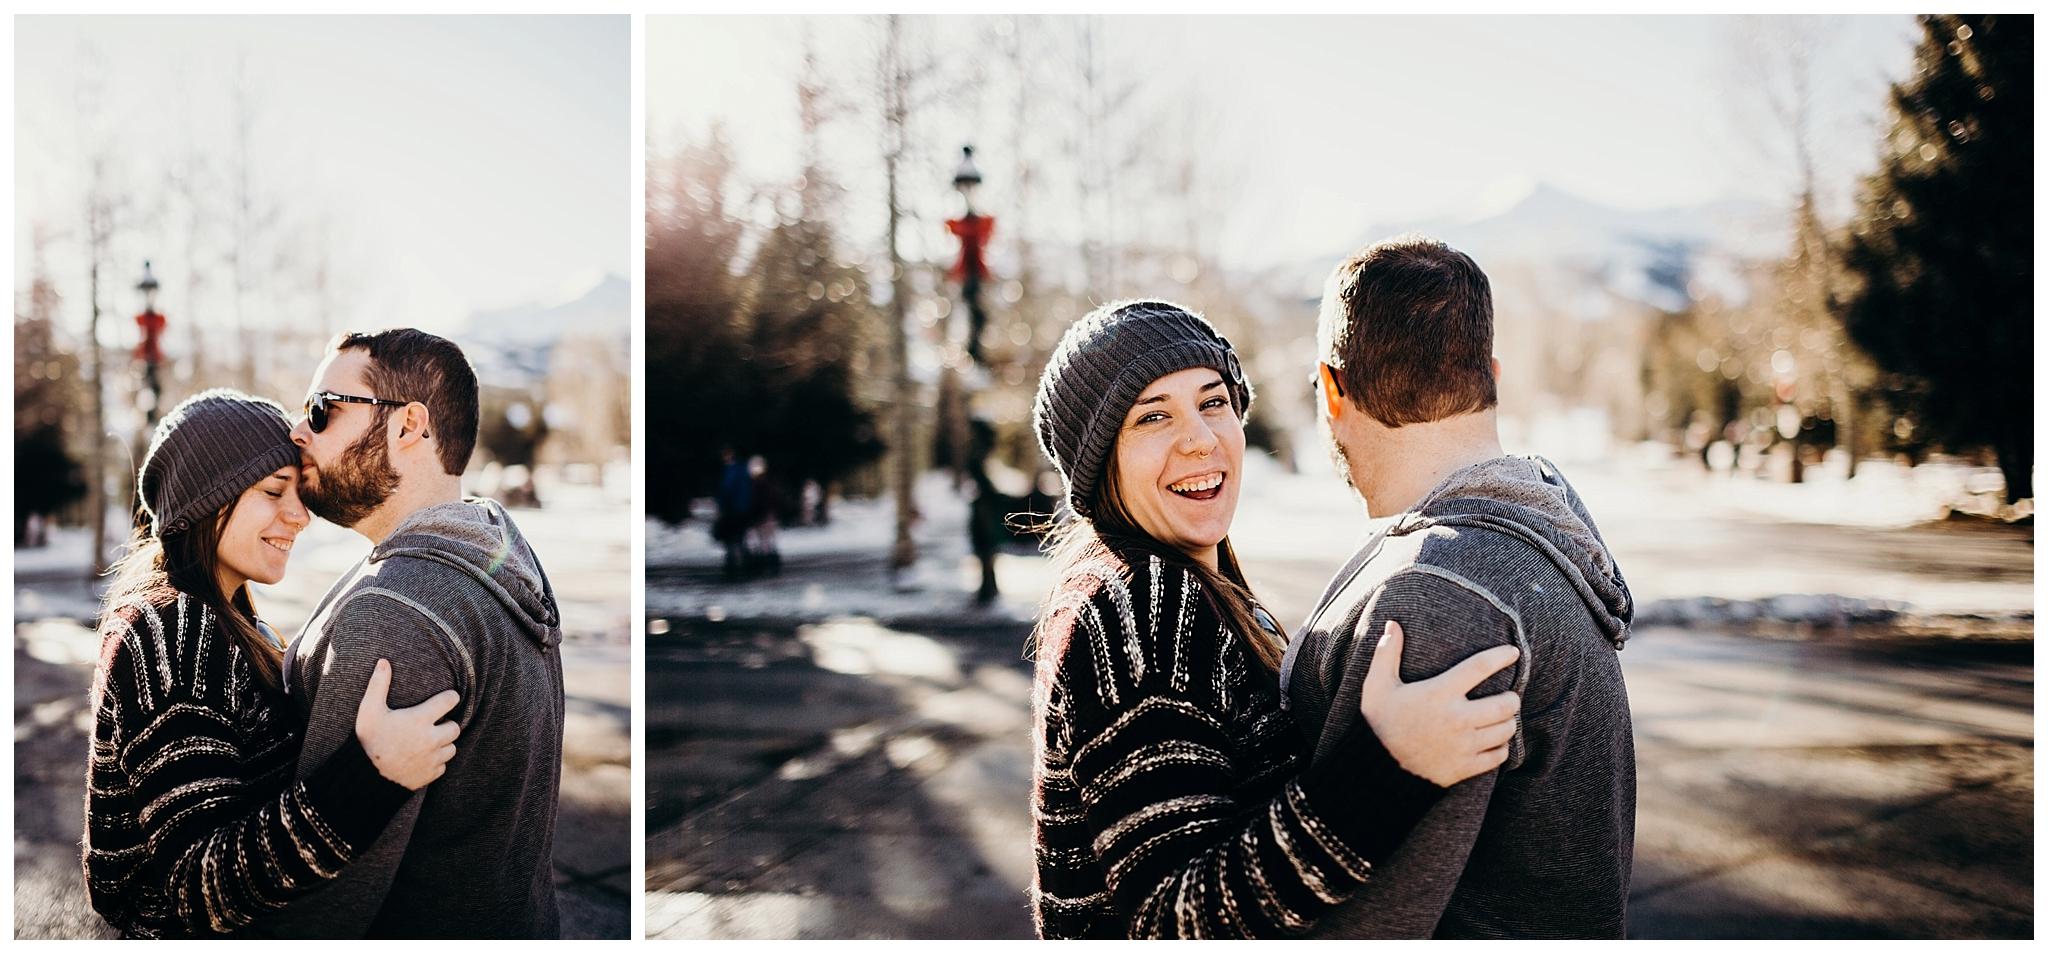 breckenridge-denver-colorado-utah-lifestyle-engagement-elopement-wedding-potographer-2.jpg